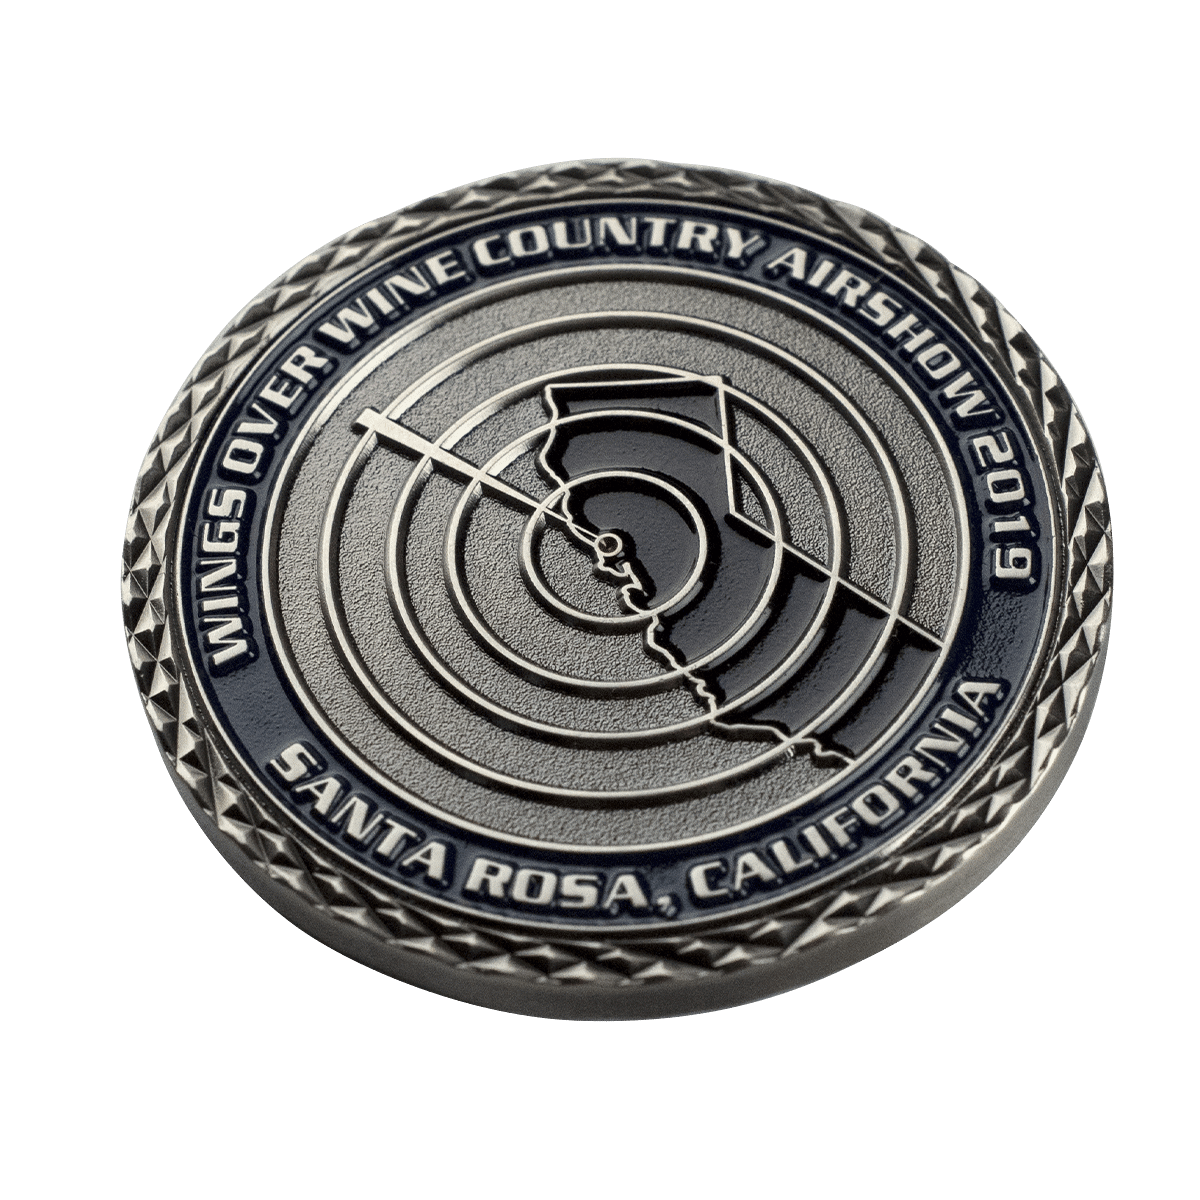 Challenge Coin Cross Cut Edge